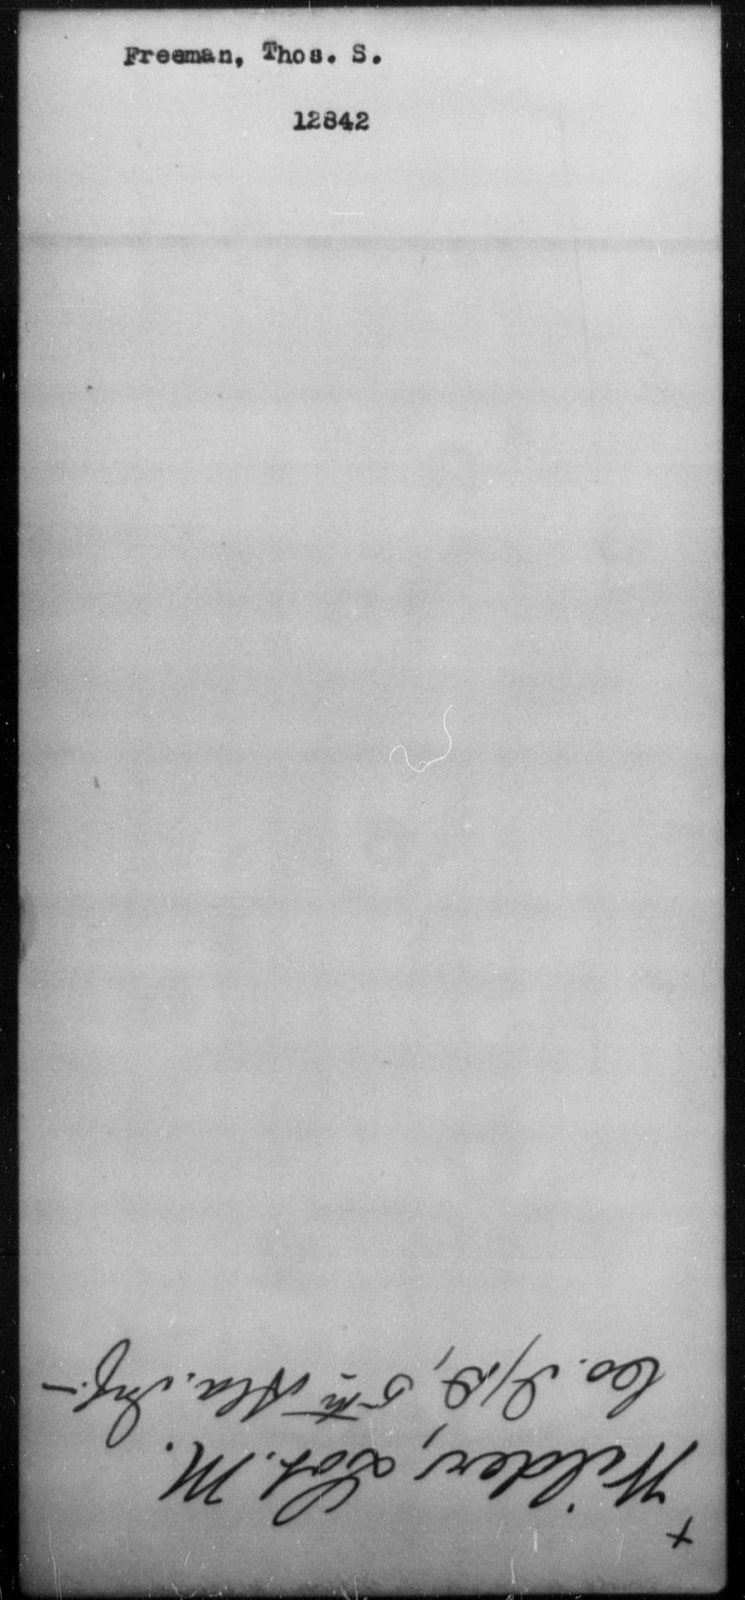 Freeman, Thos S - State: [Blank] - Year: [Blank]